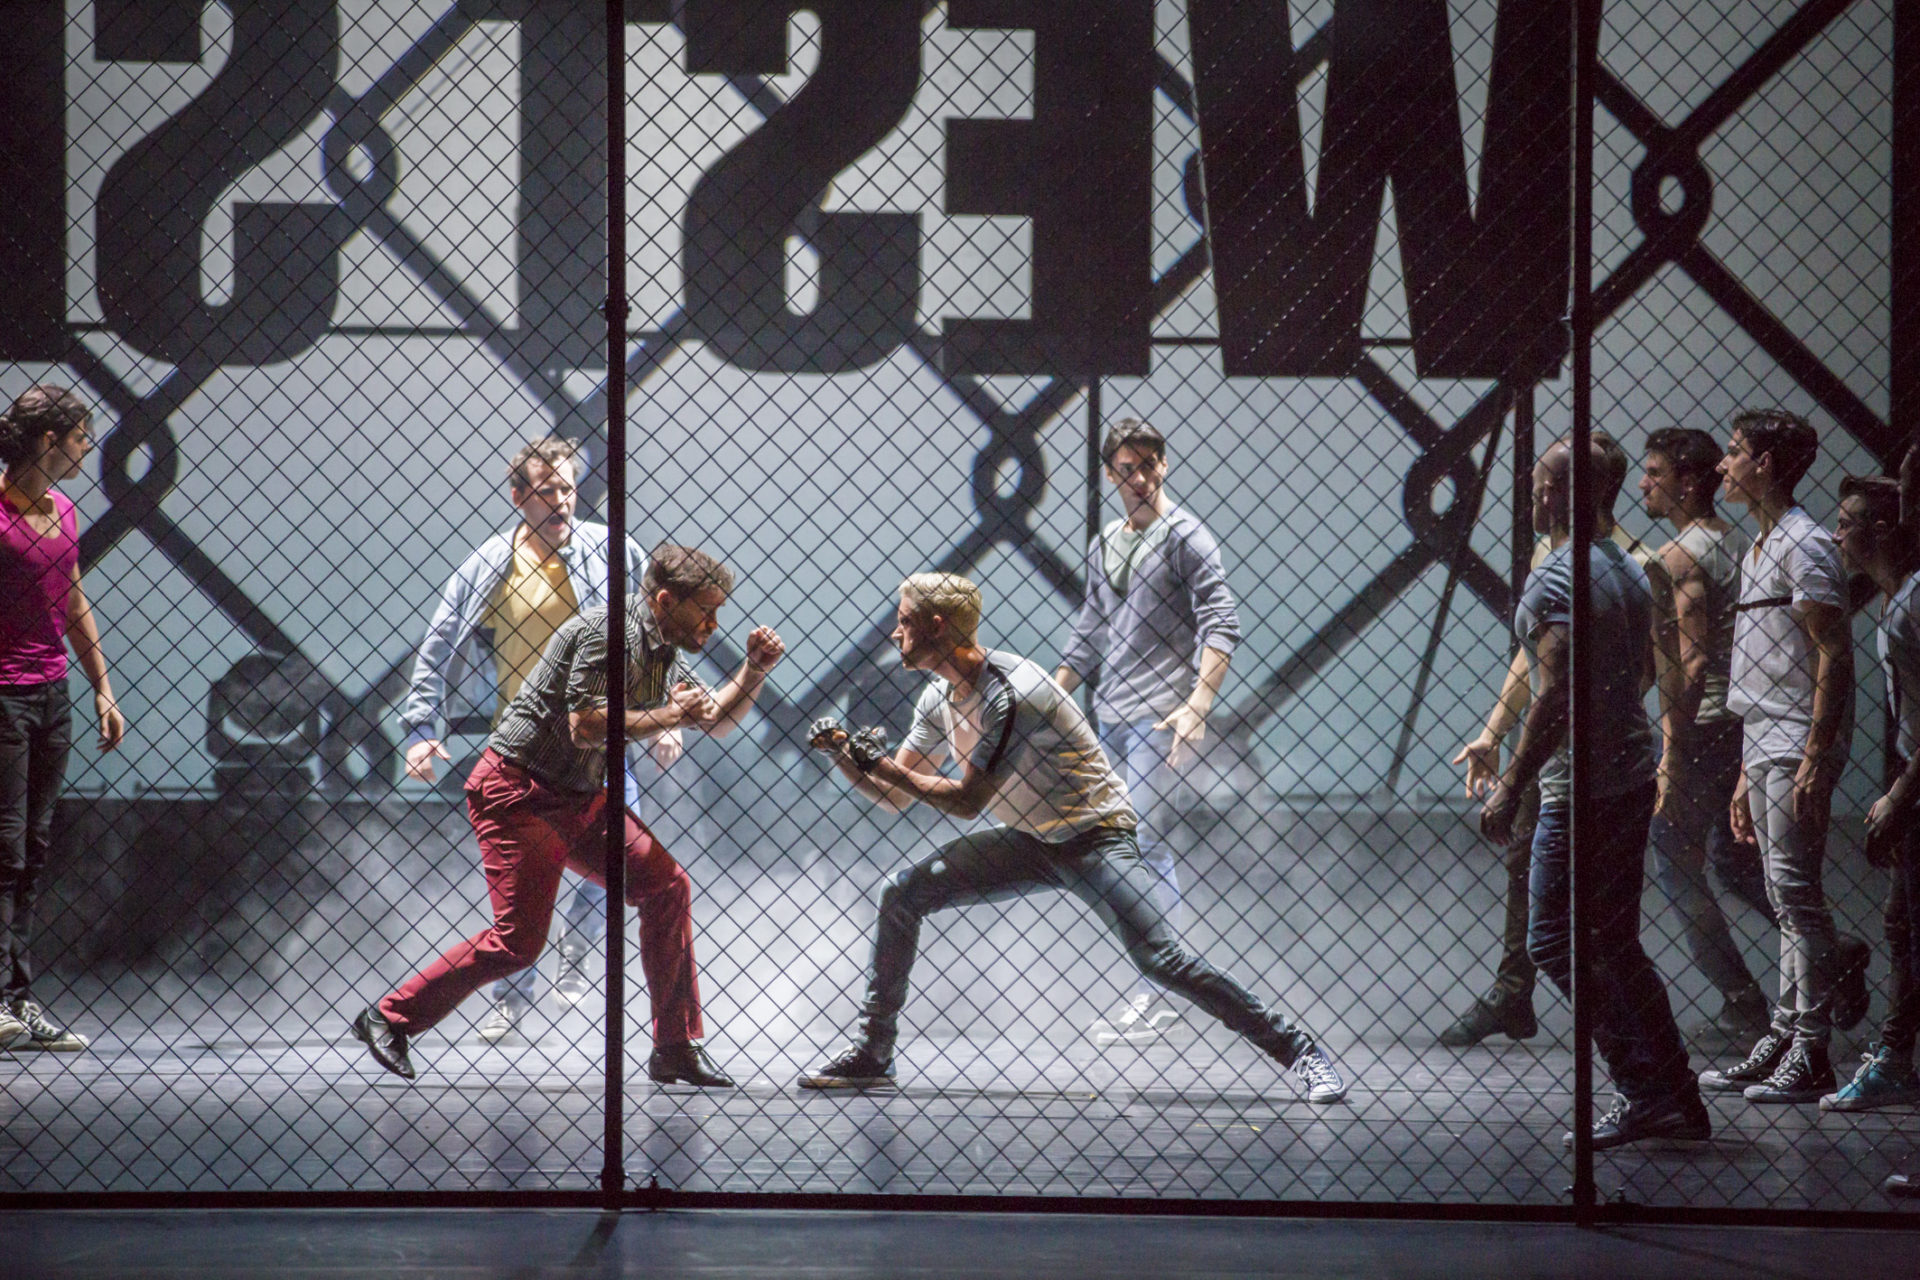 F. Stern, M. Souschek, S. Maxted, Ensemble - Foto @ Rupert Larl